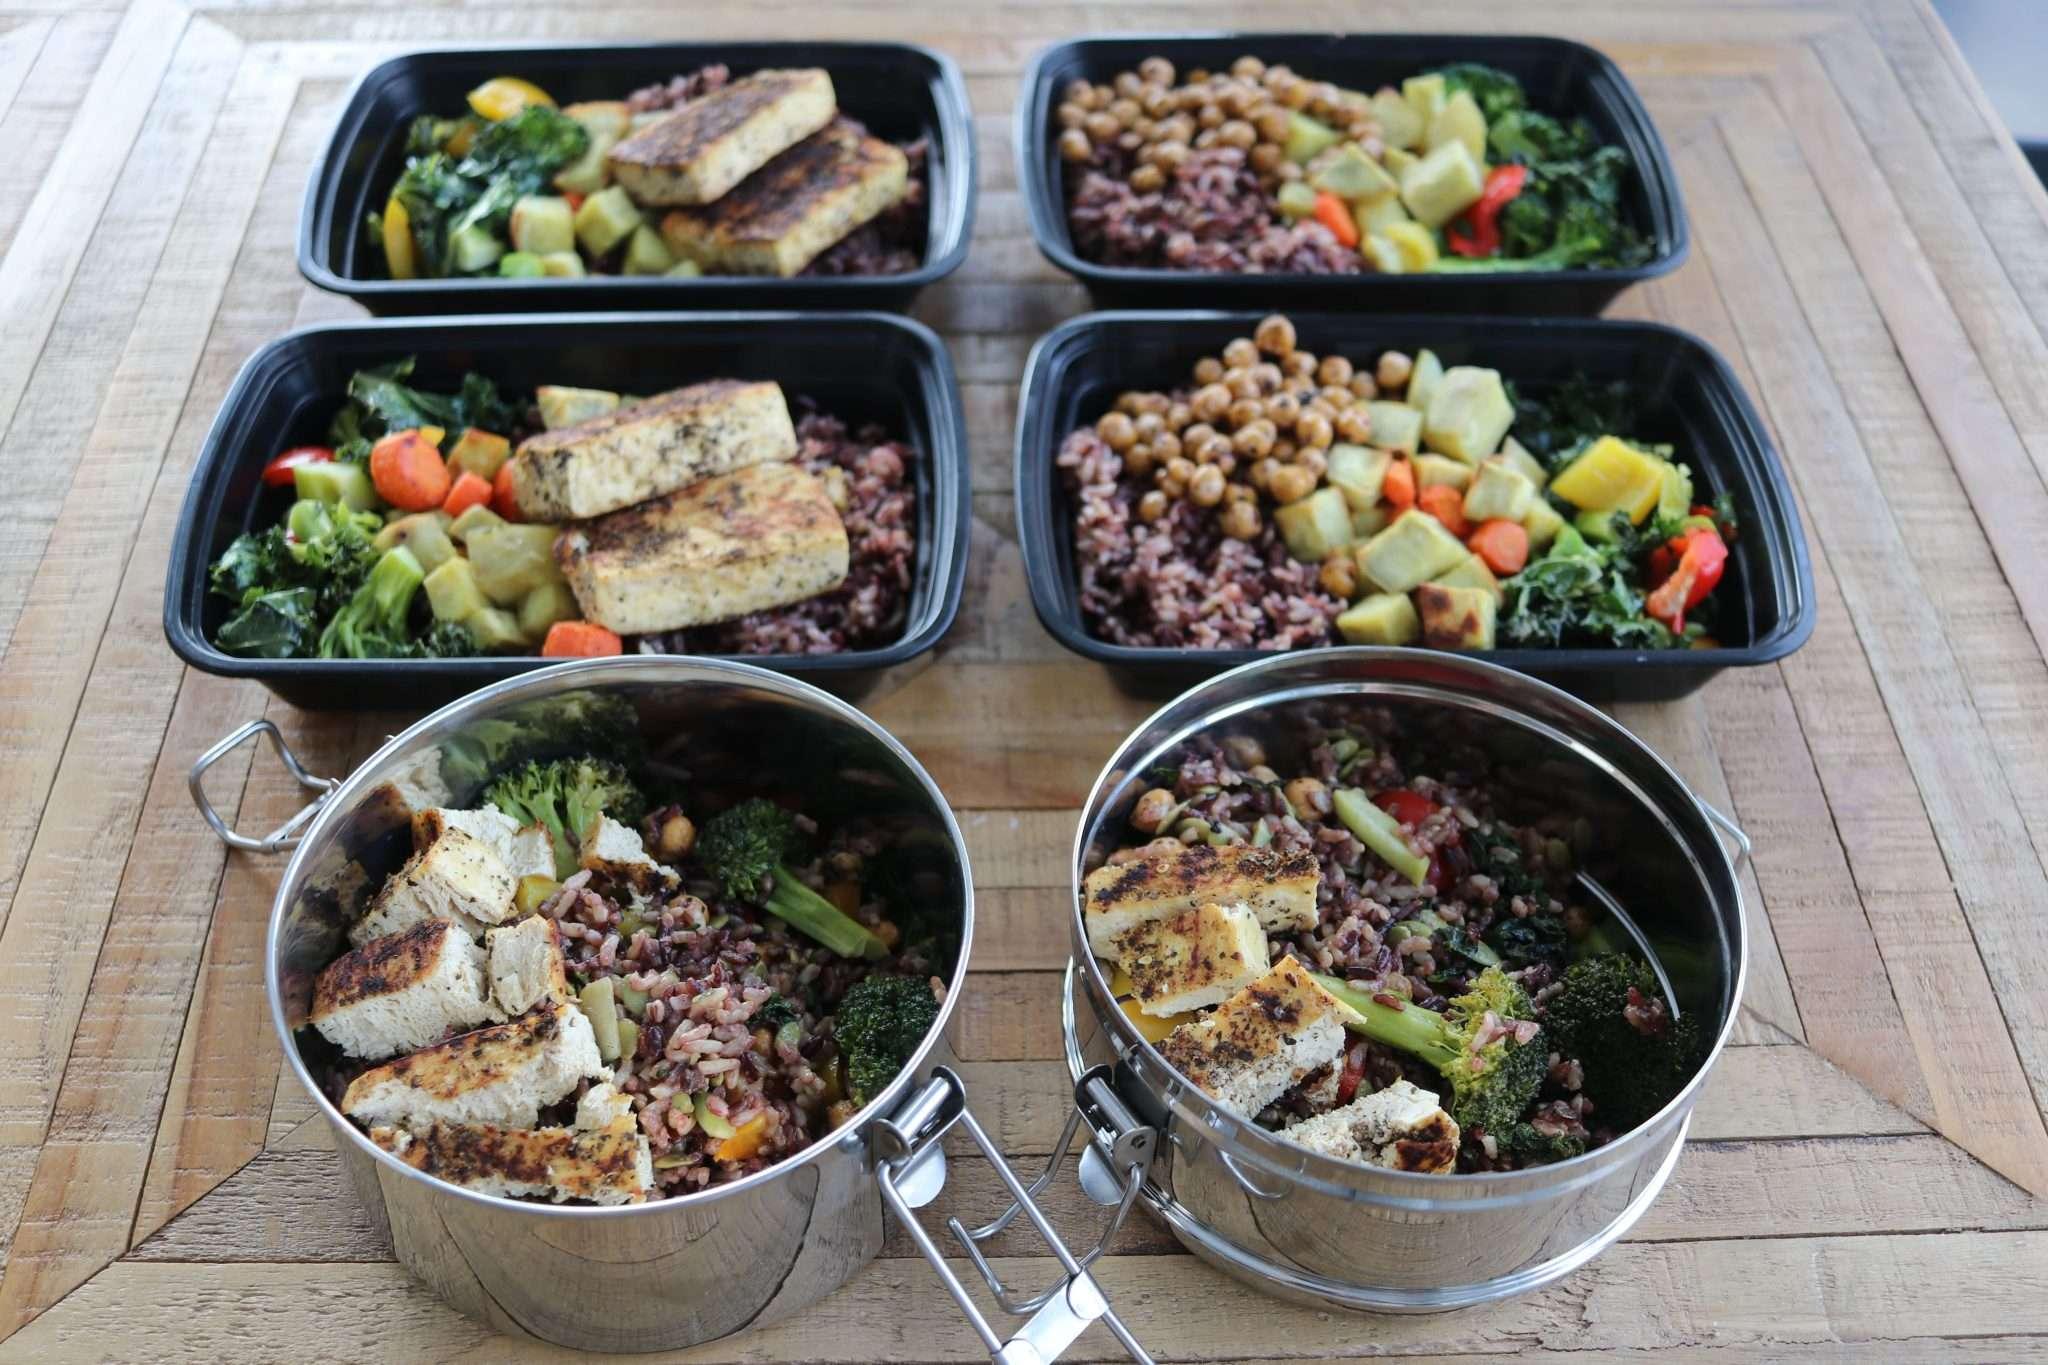 Easy Whole Foods Plant Based Meal Prep Vegan Gluten Free Cheap Lazy Vegan